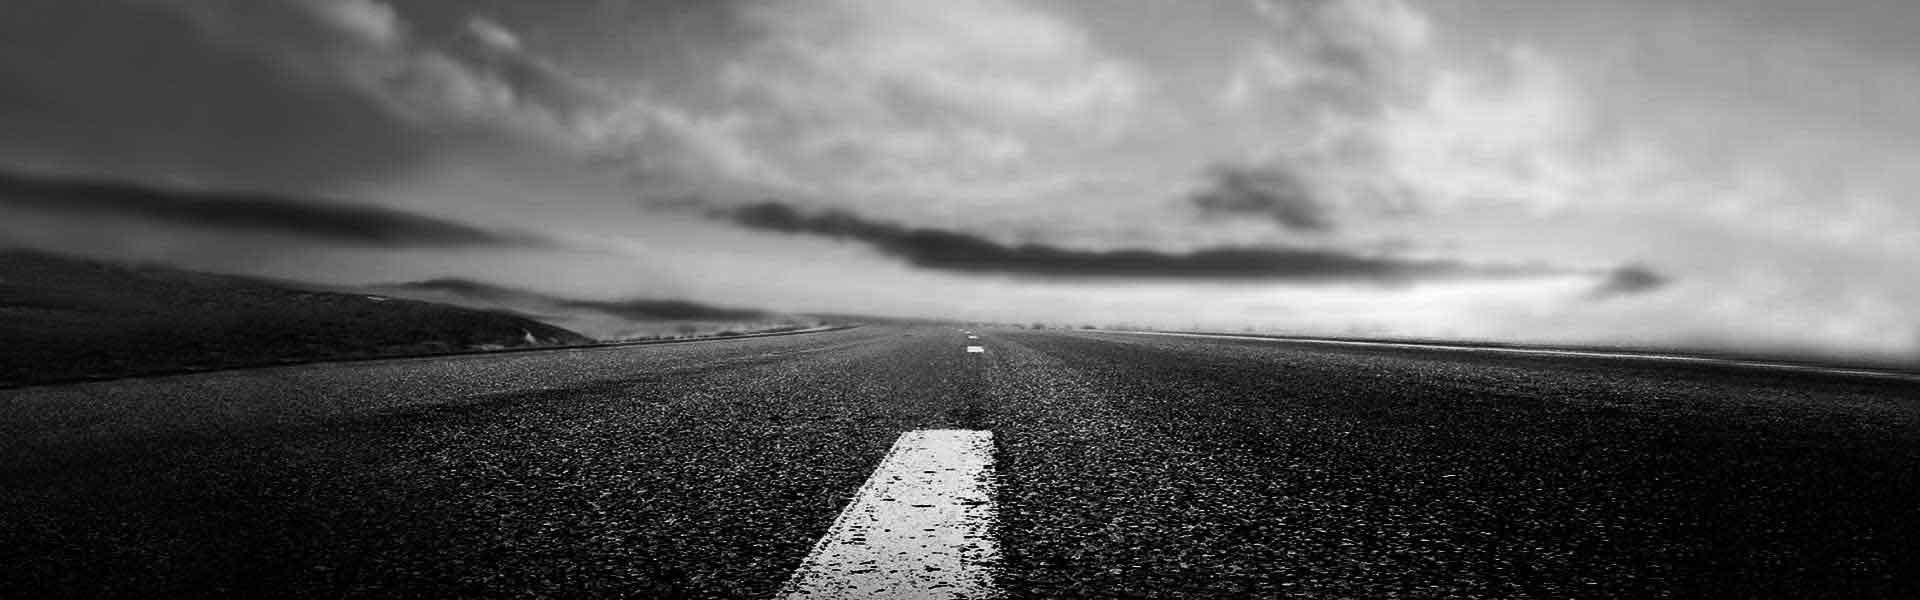 ambrosio_road_featured